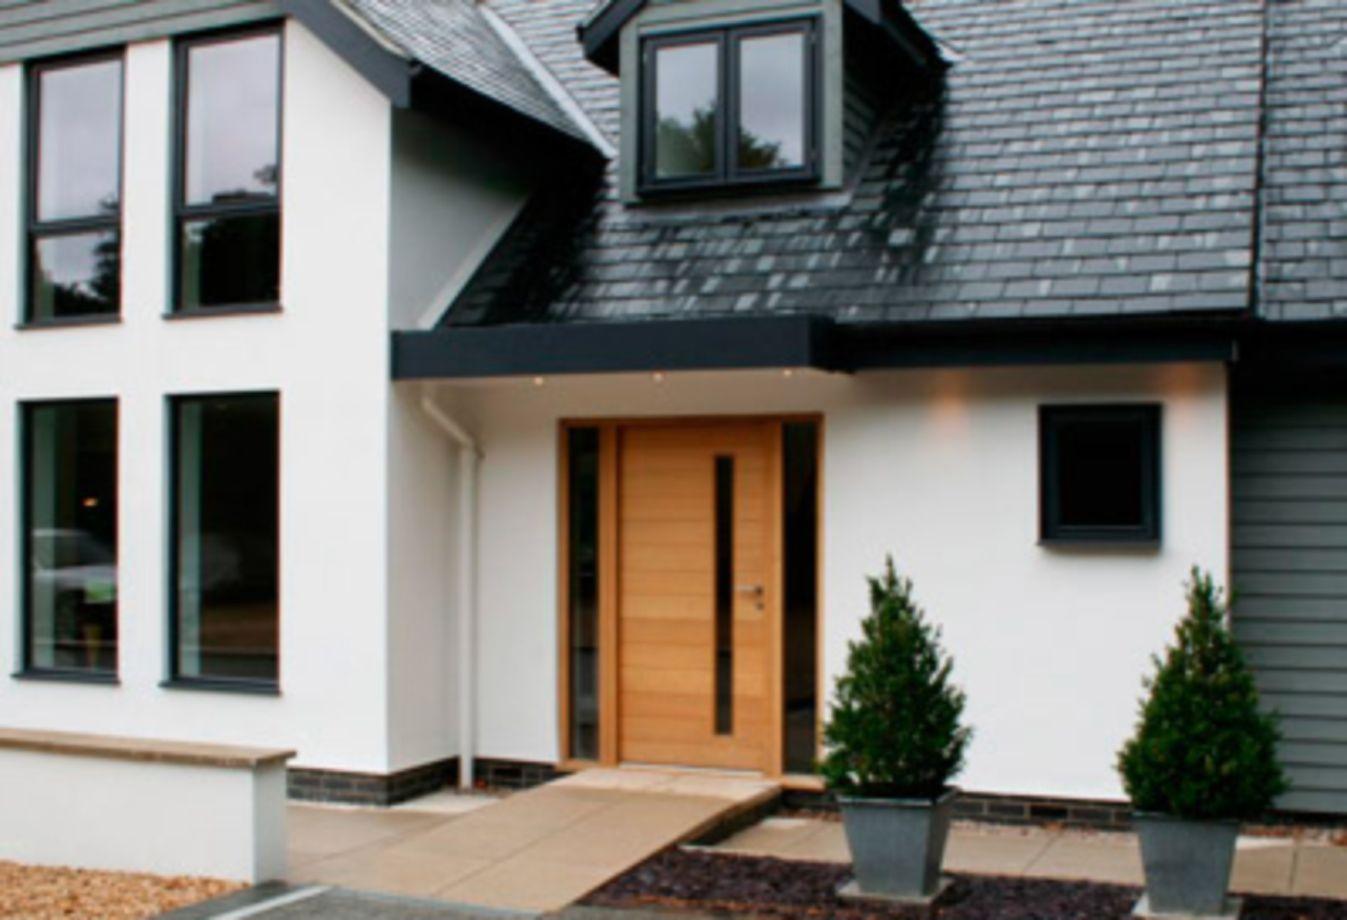 Exterior modern siding window design   beautiful front door exterior design ideas  front doors